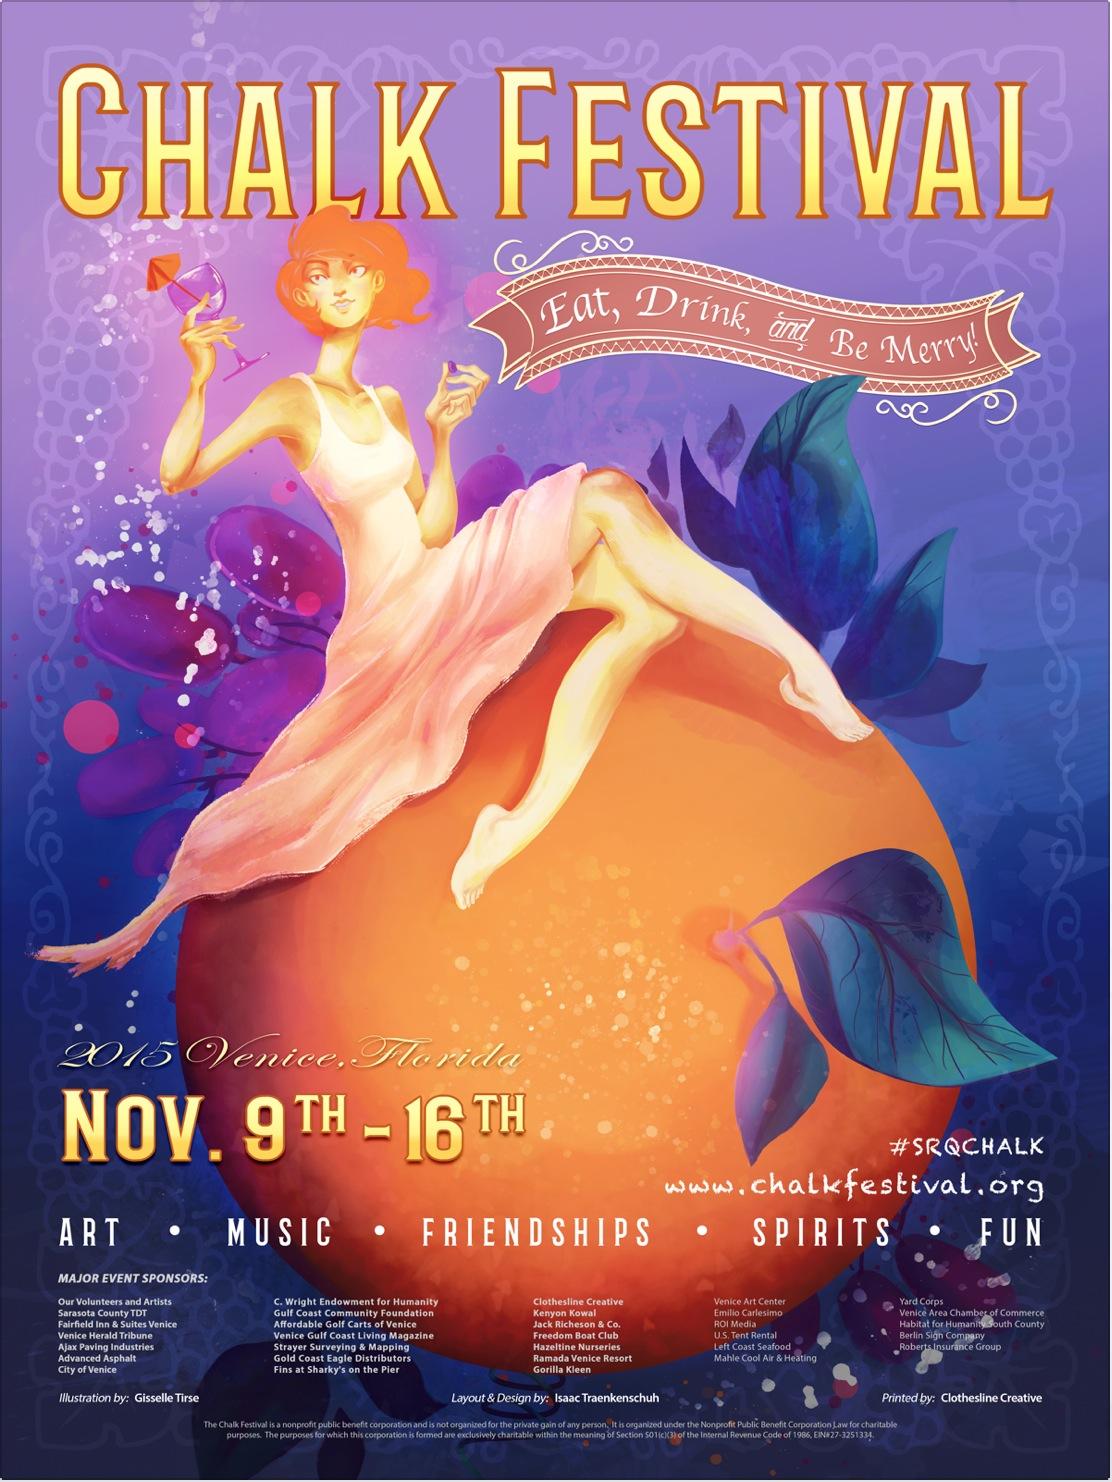 Sarasota Chalk Festival 2015 Art direction